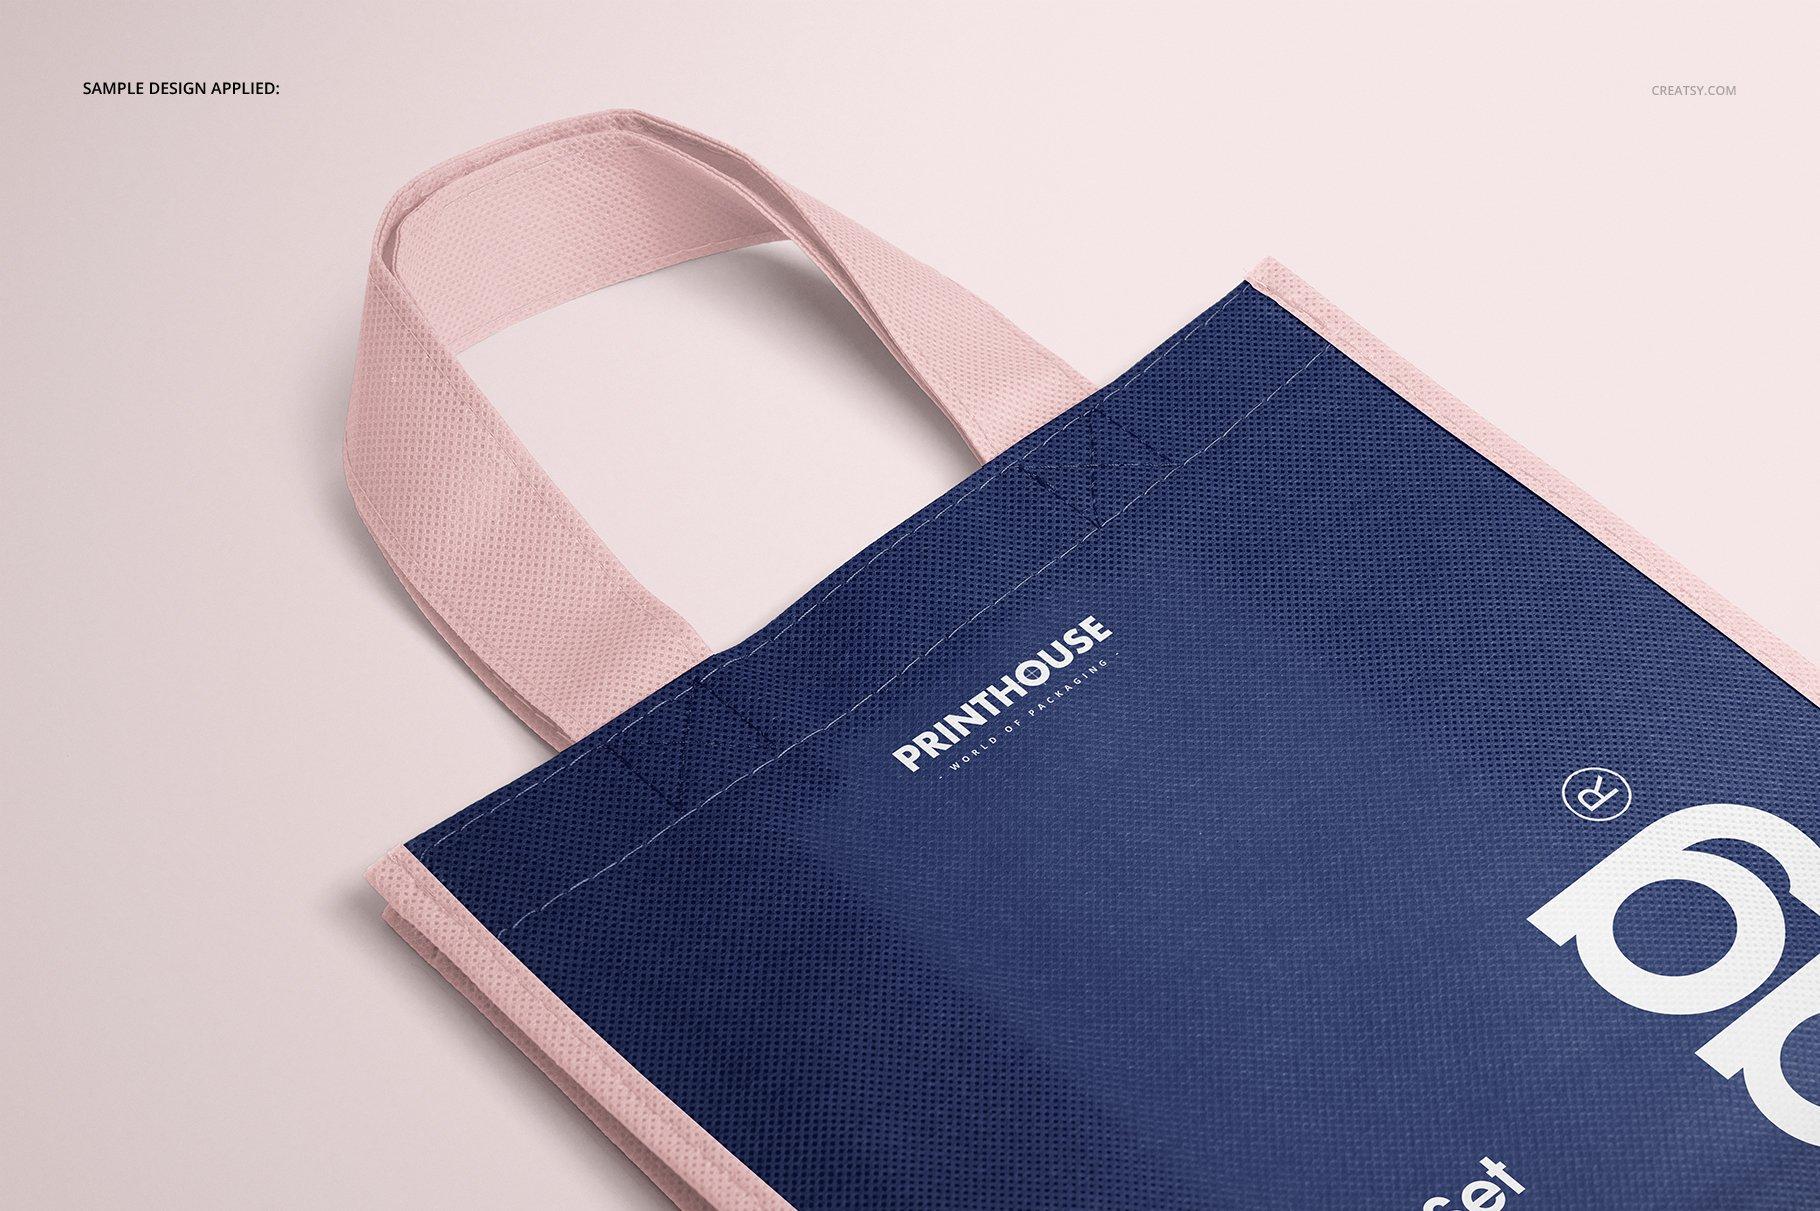 [淘宝购买] 无纺布袋手提袋设计展示样机模板套装 Non-Woven Tote Bag Mockup Set插图(7)